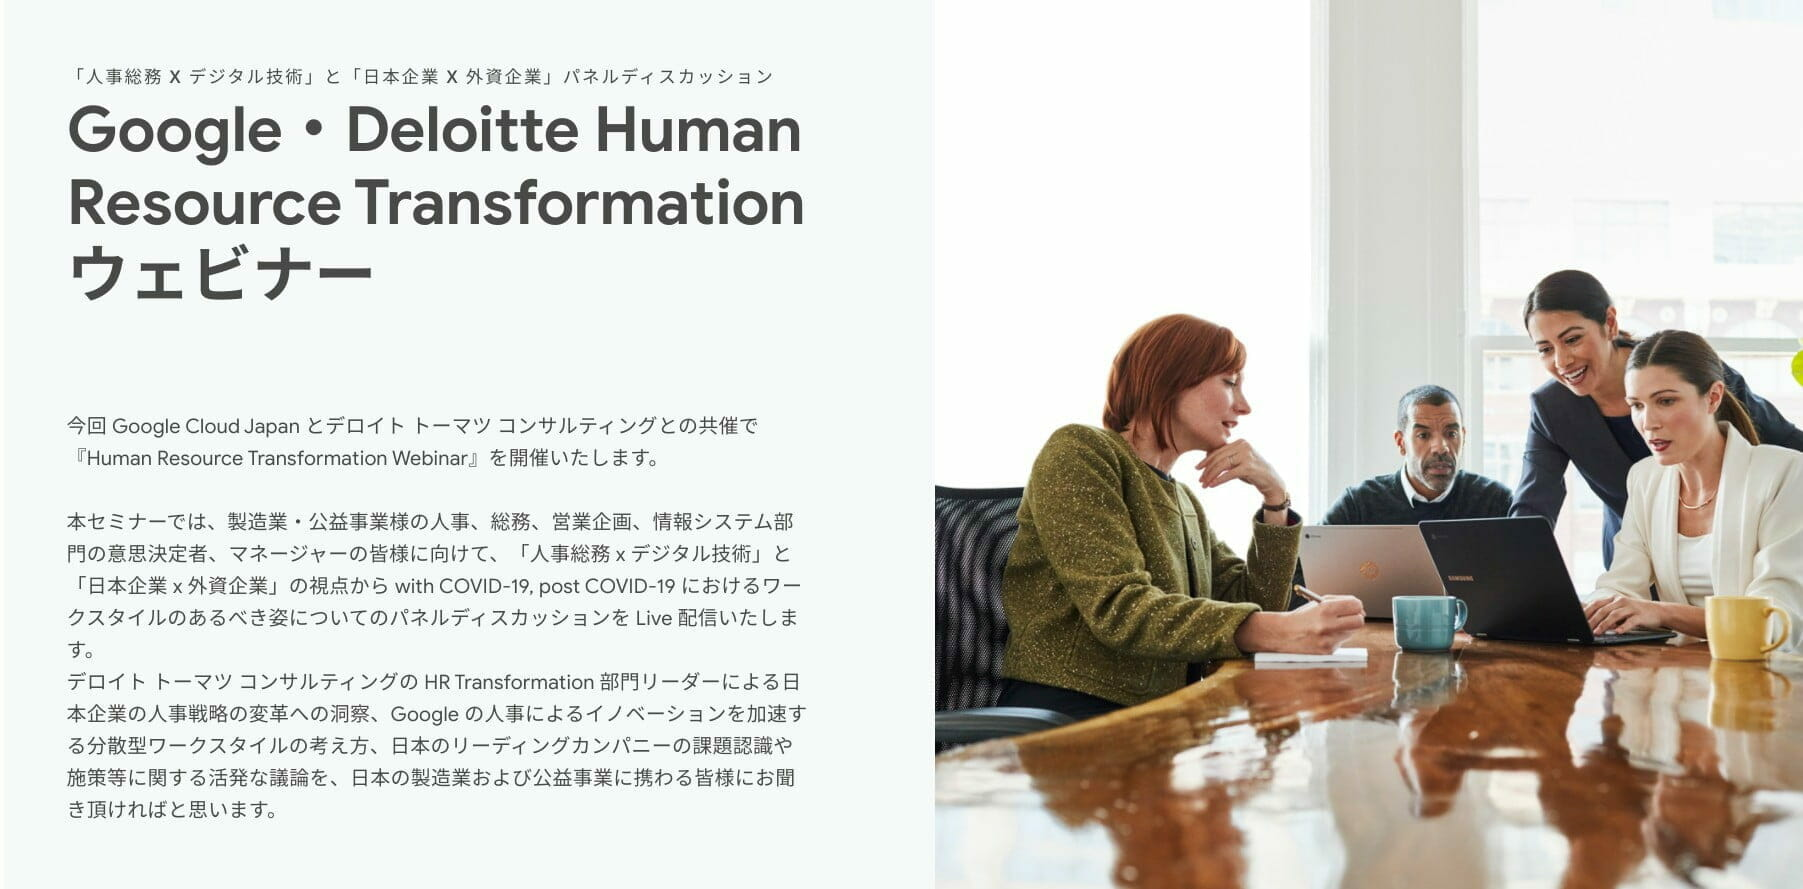 Google・Deloitte Human Resource Transformation ウェビナー